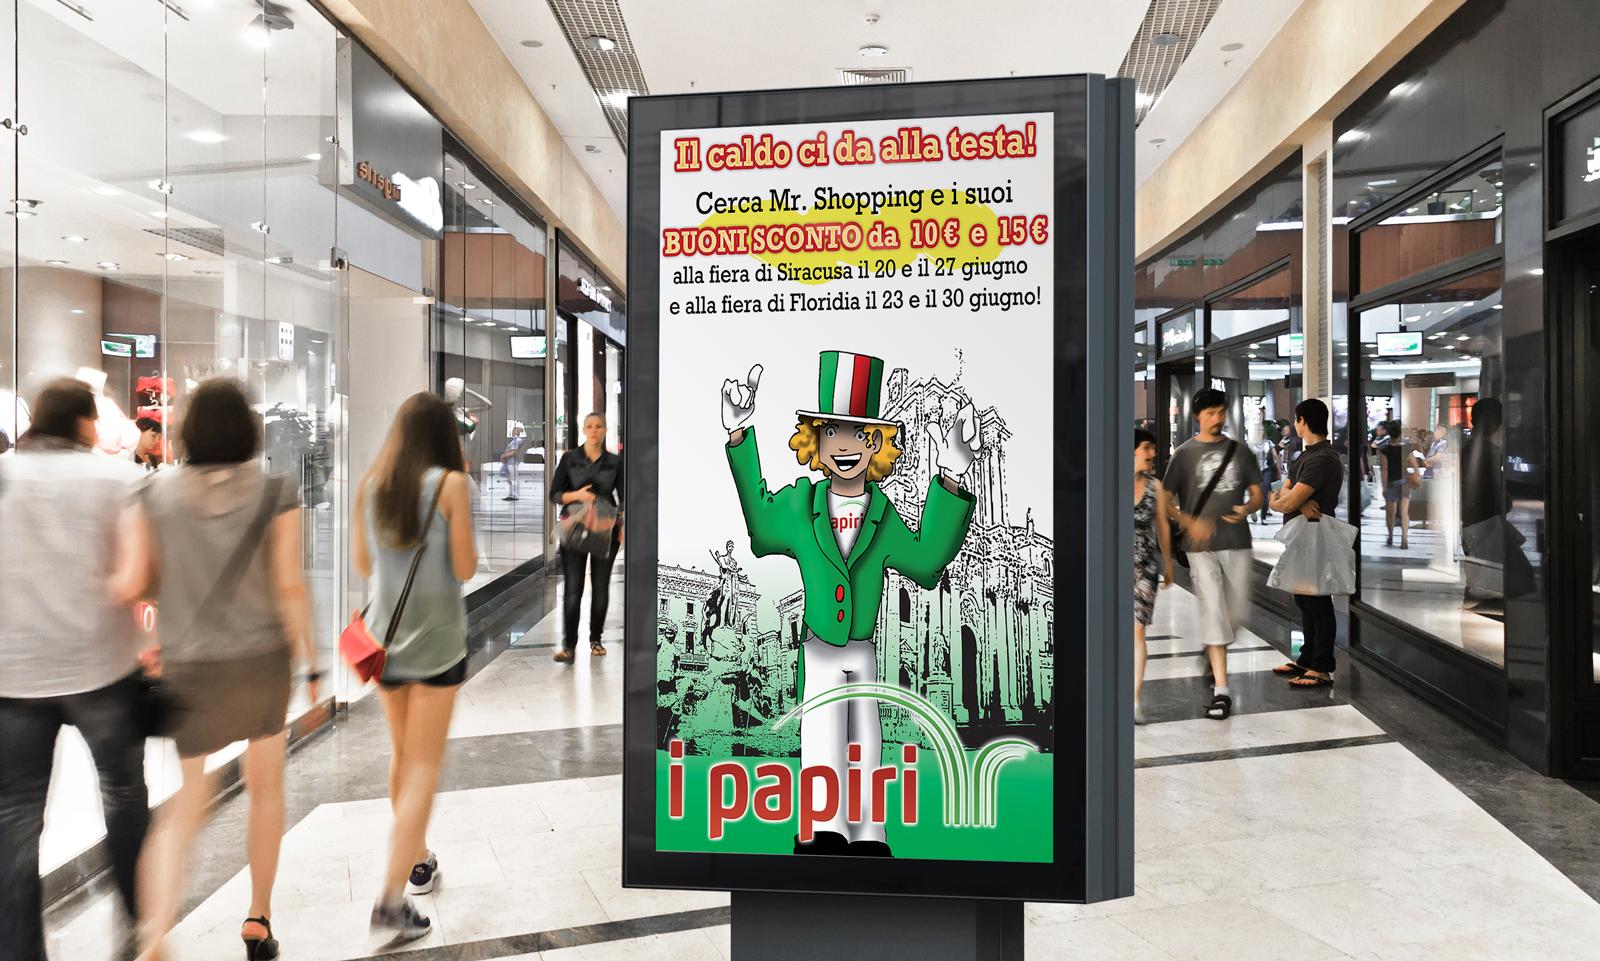 2012 C.C. I PAPIRI - Linea 11 Siracusa - Comunicazione, pubblicità, adv, eventi, web